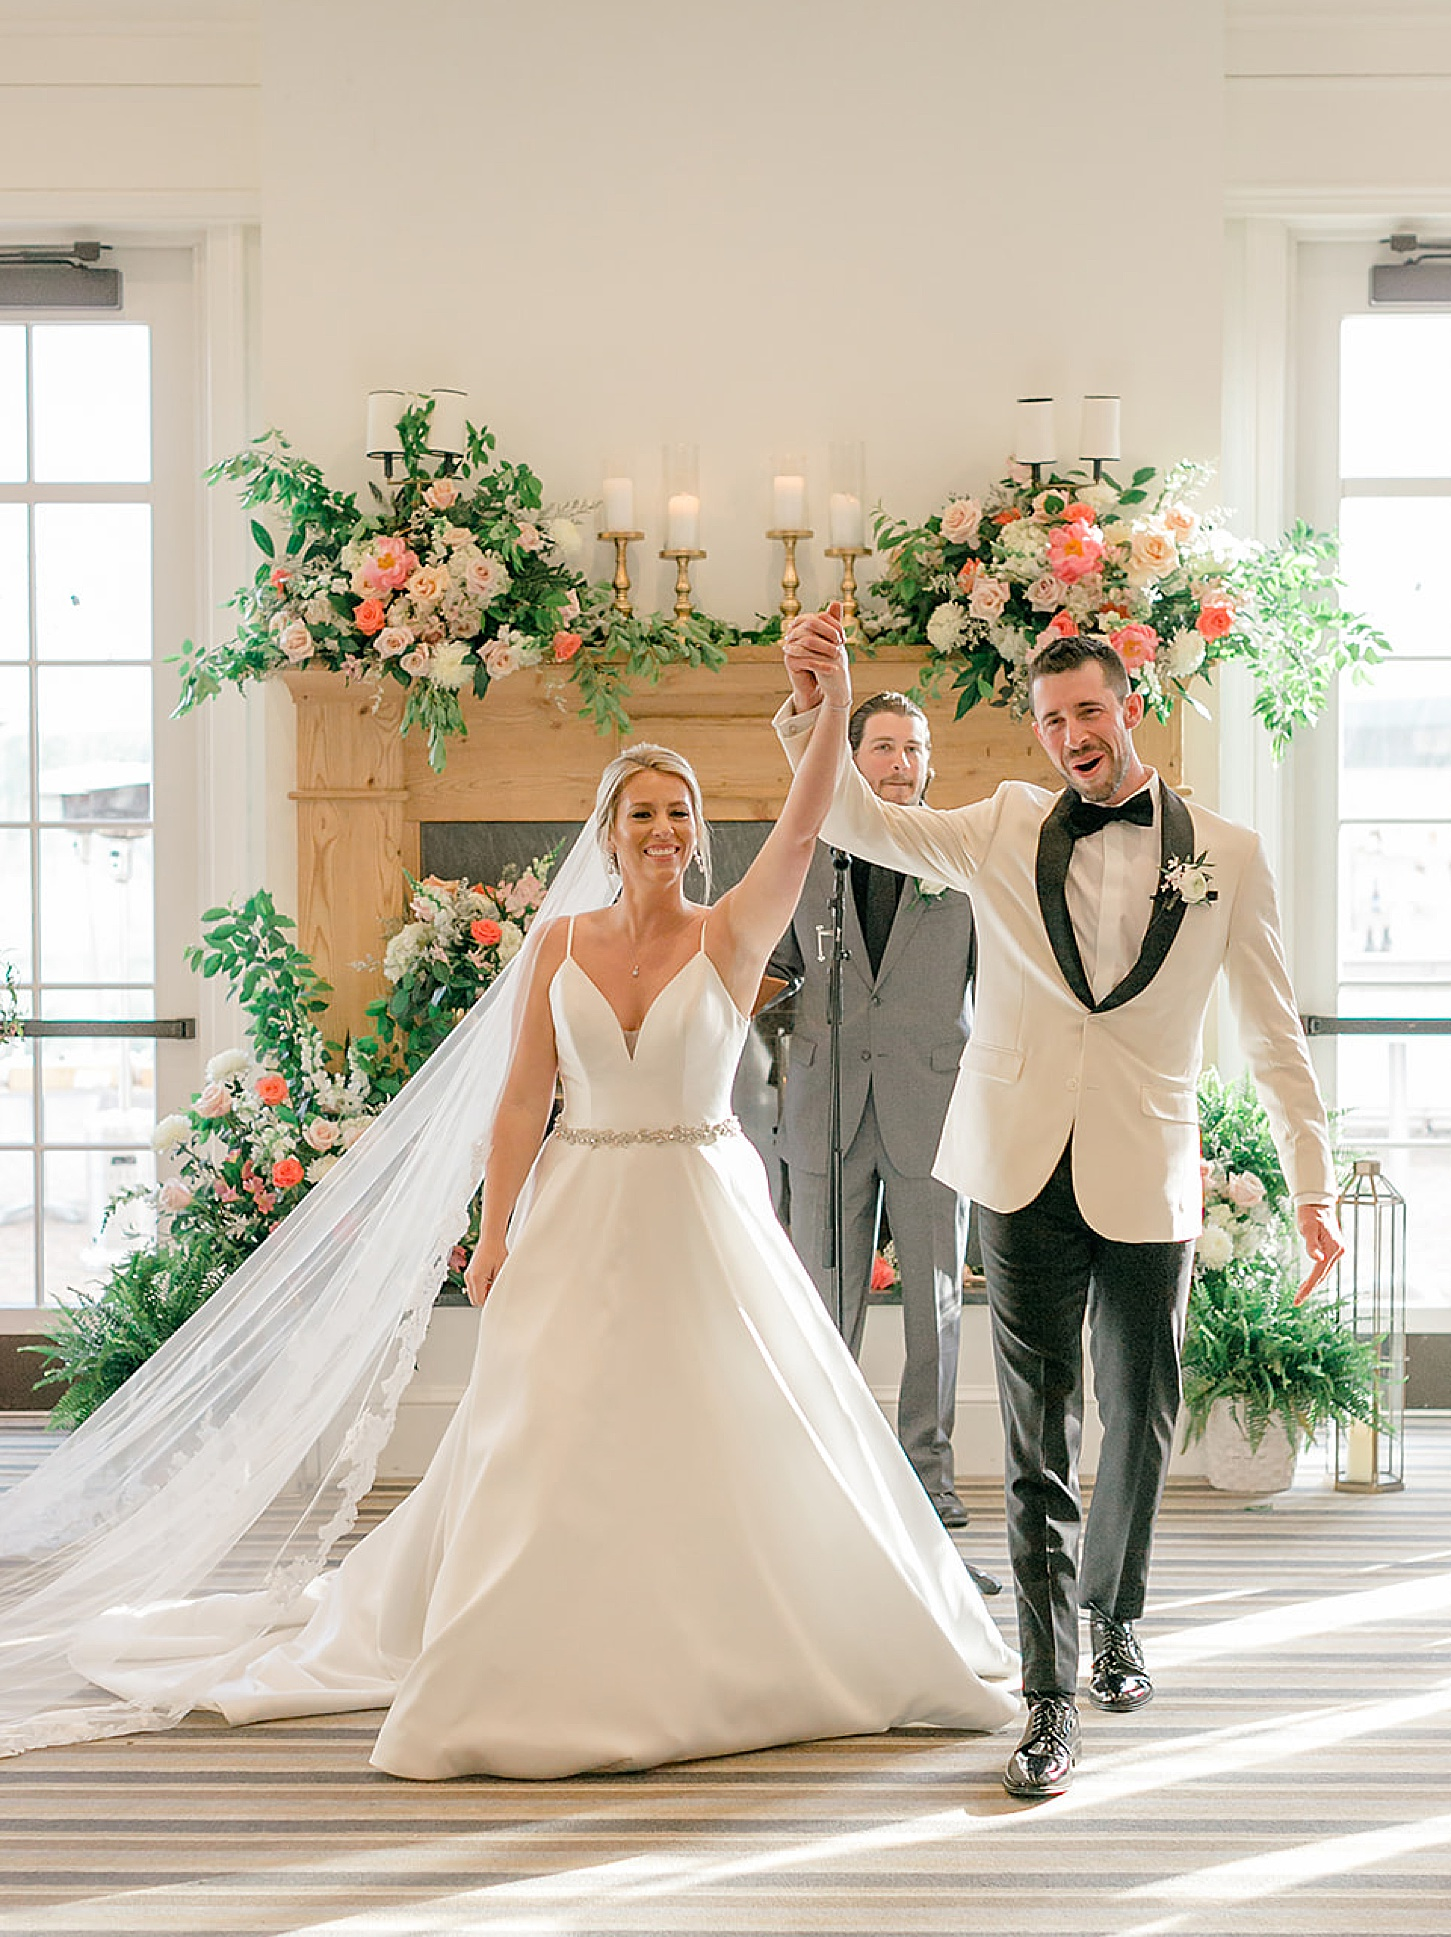 Linwood Country Club Summer Wedding Photography Studio by Magdalena Studios Jenn Kyle 0029